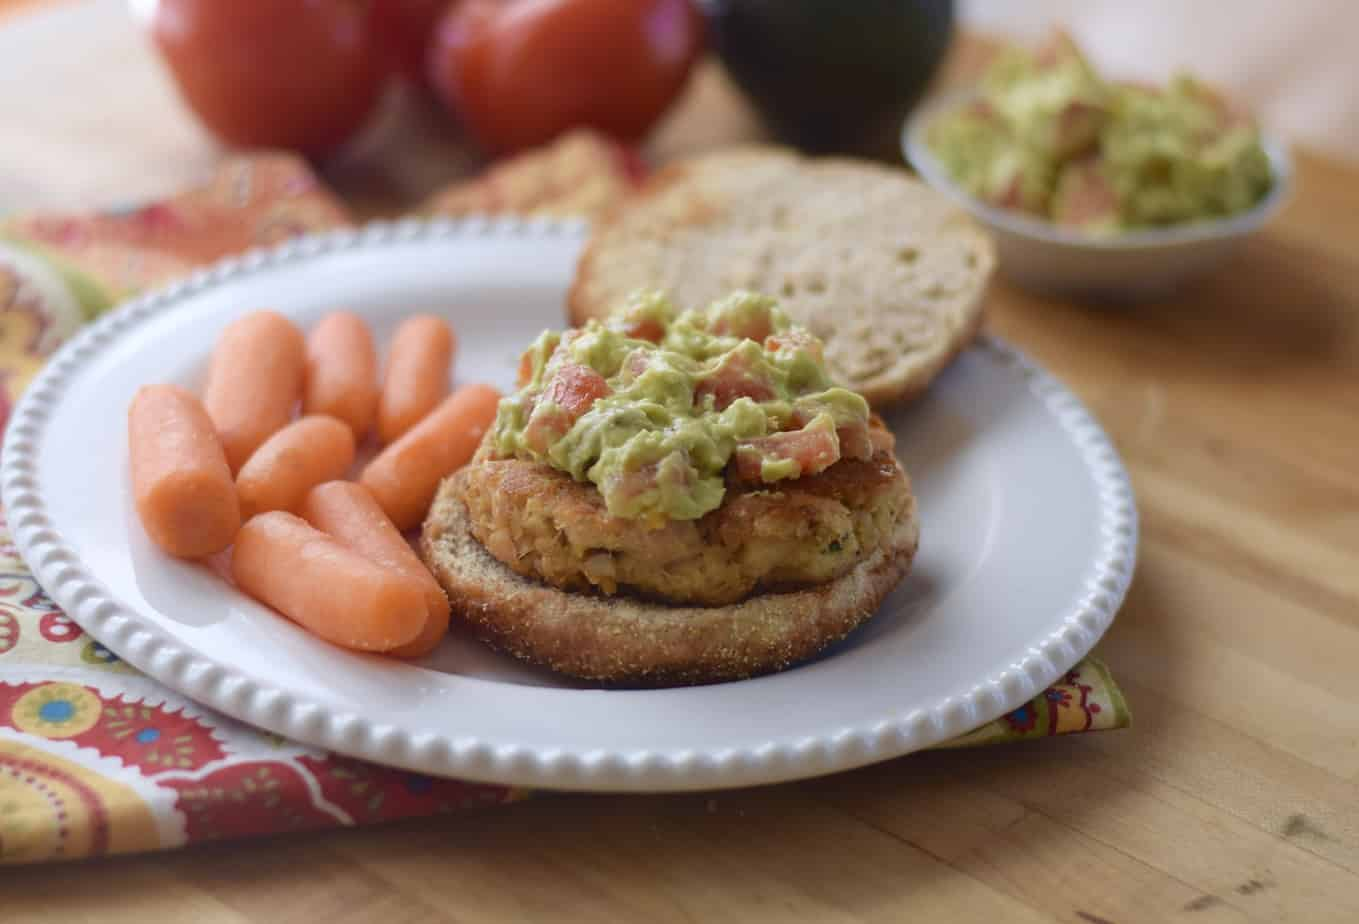 tuna burger on bun topped with avocado-tomato mixture